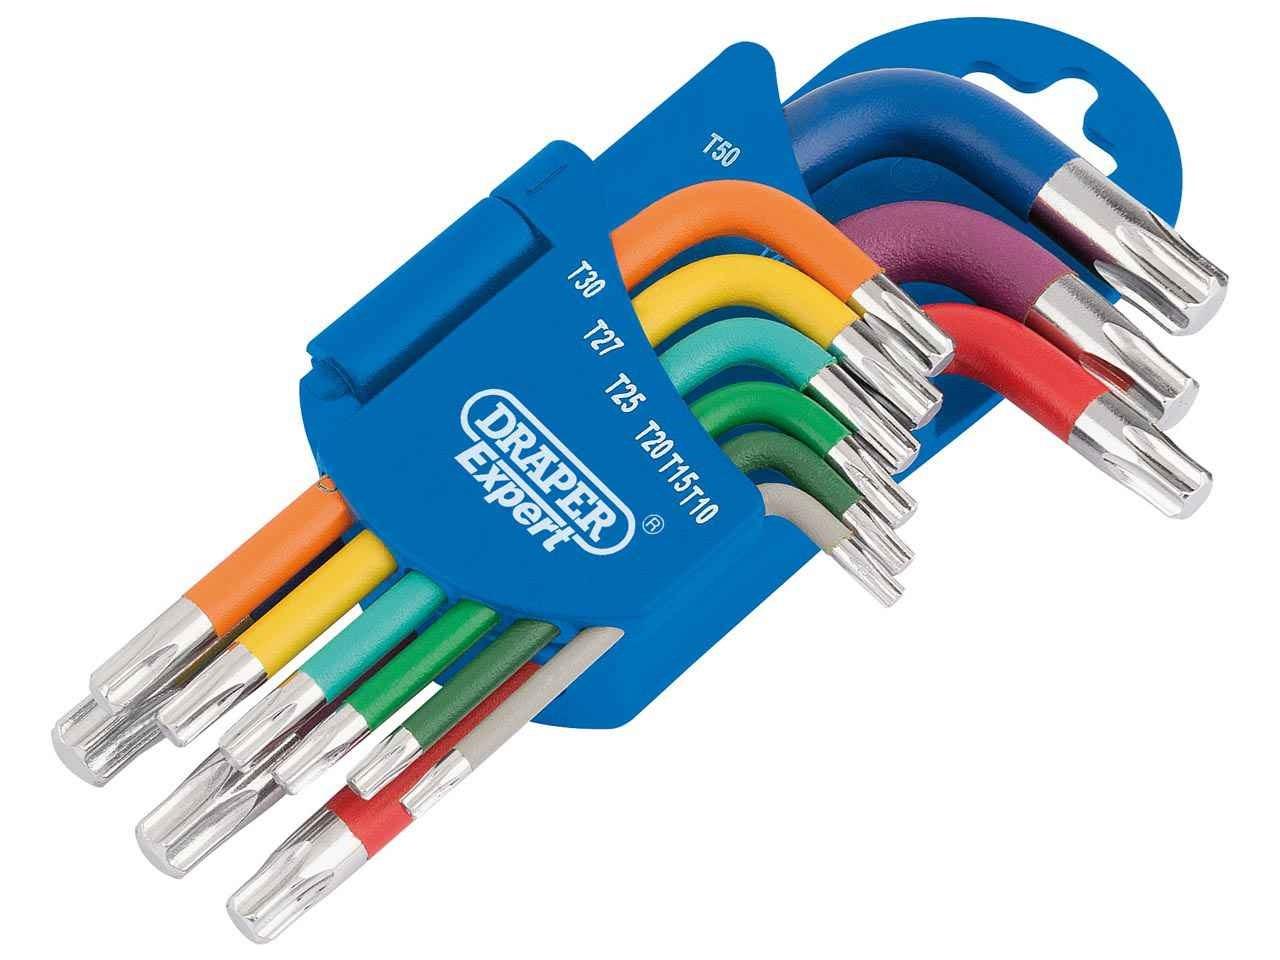 Metric Coloured Short Arm Draper TX-STAR Key Set (9 Piece) – Now Only £11.00